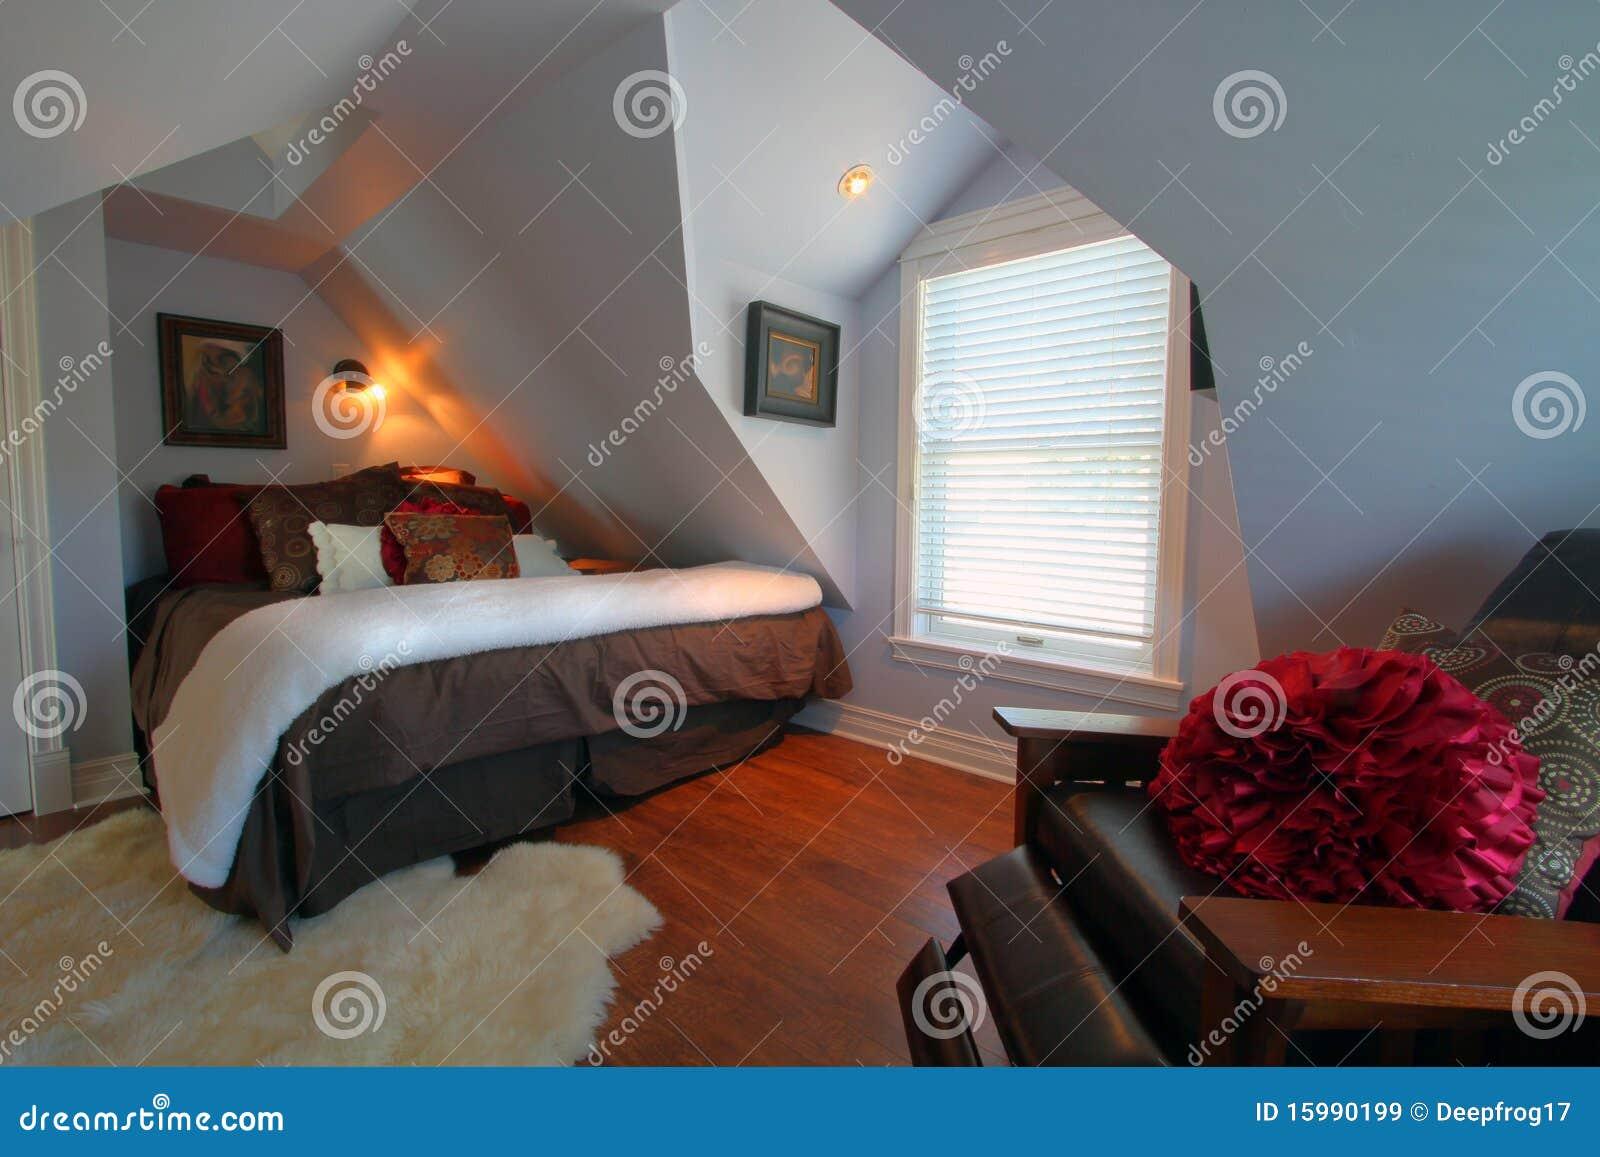 Chambre coucher moderne luxueuse images libres de droits for Chambre luxueuse